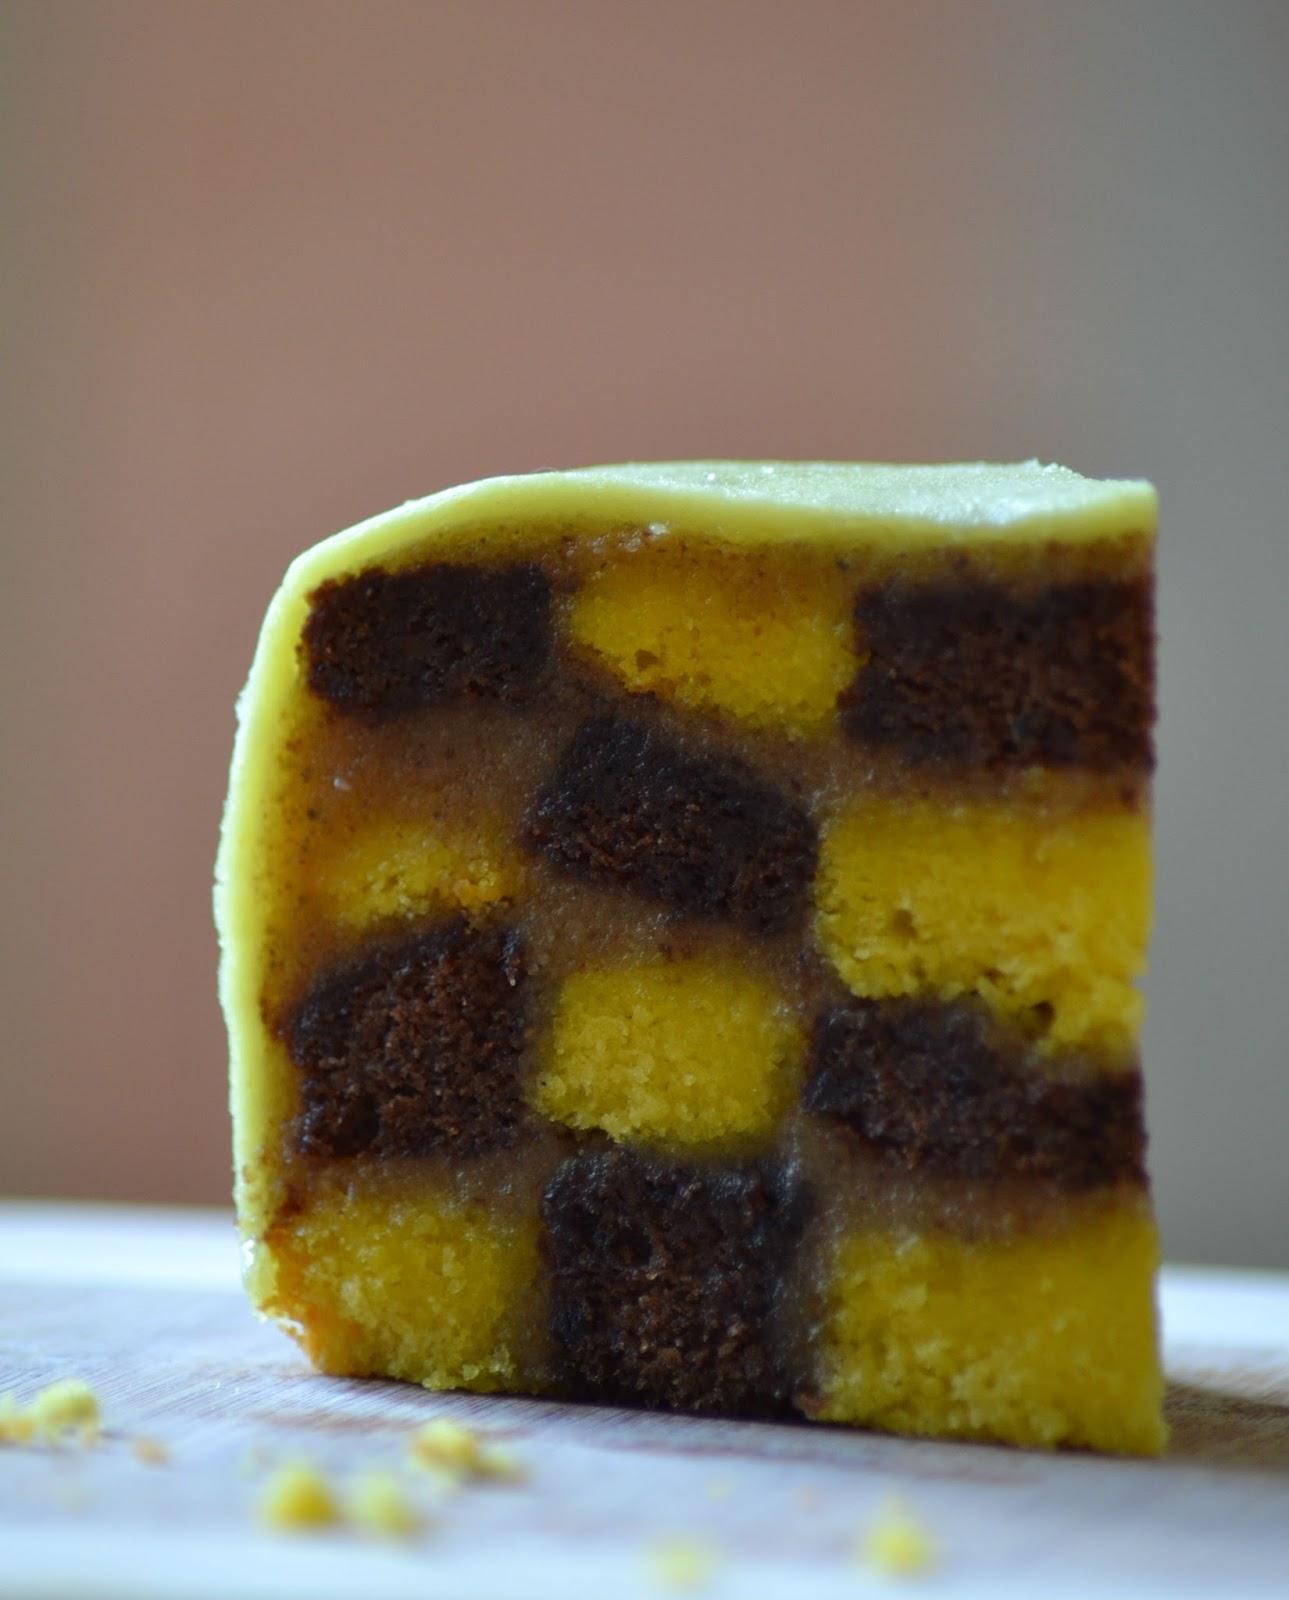 Recept Heel Holland bakt 2015: Battenberg cake